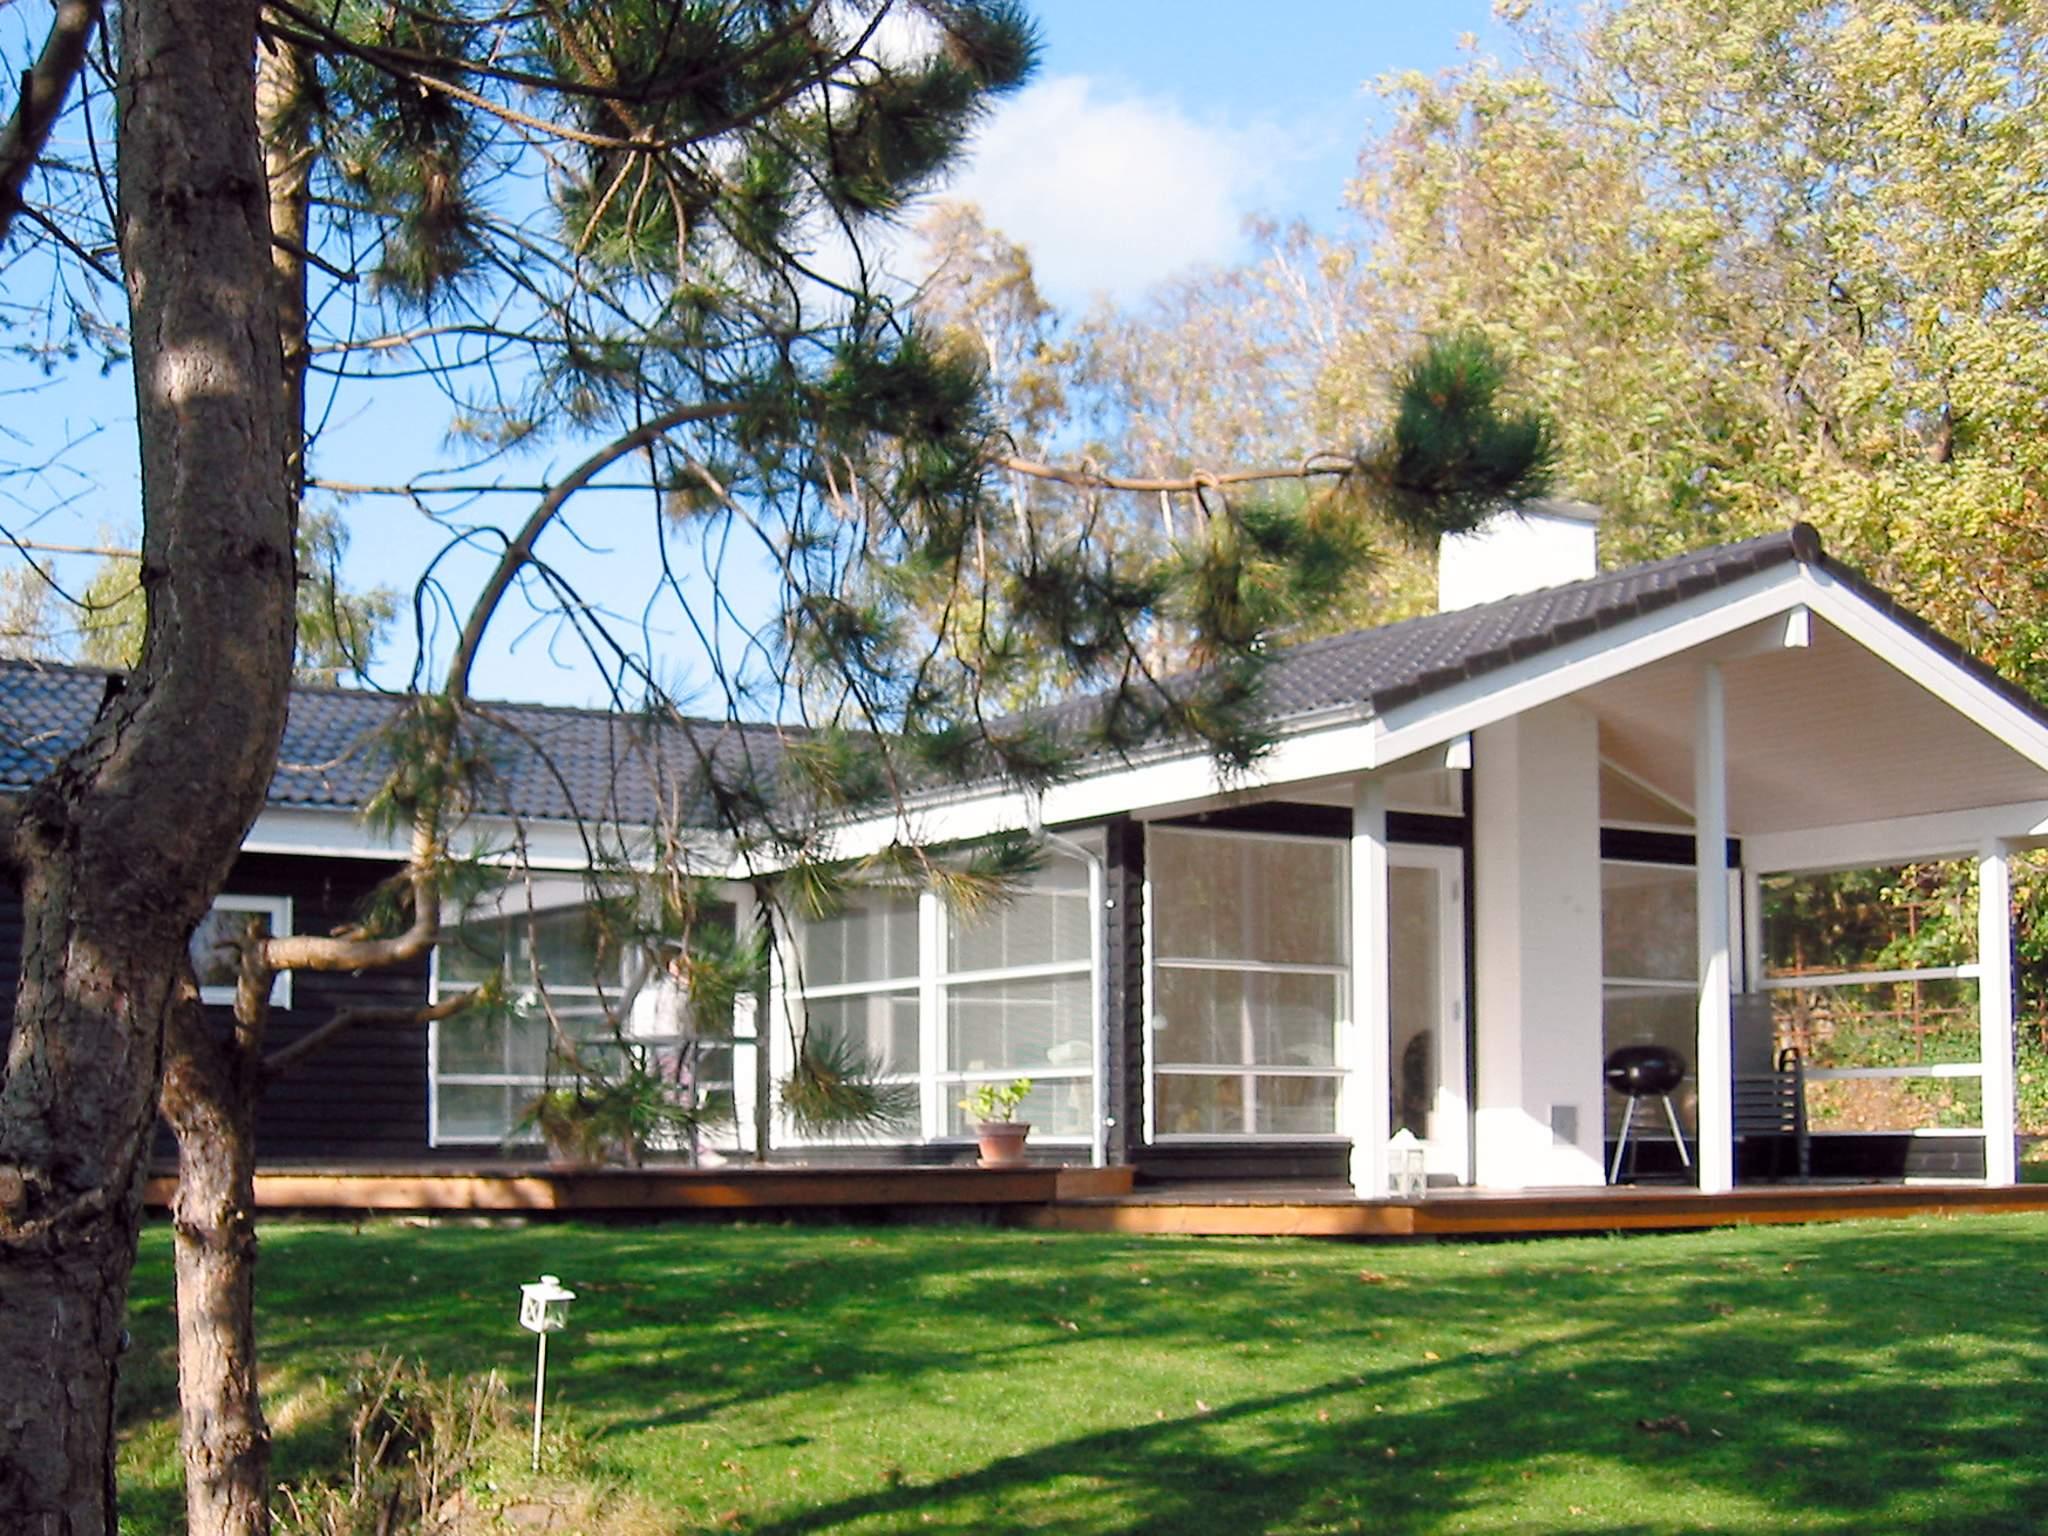 Maison de vacances Skibby (124927), Kirke Hyllinge, , Seeland Nord, Danemark, image 19